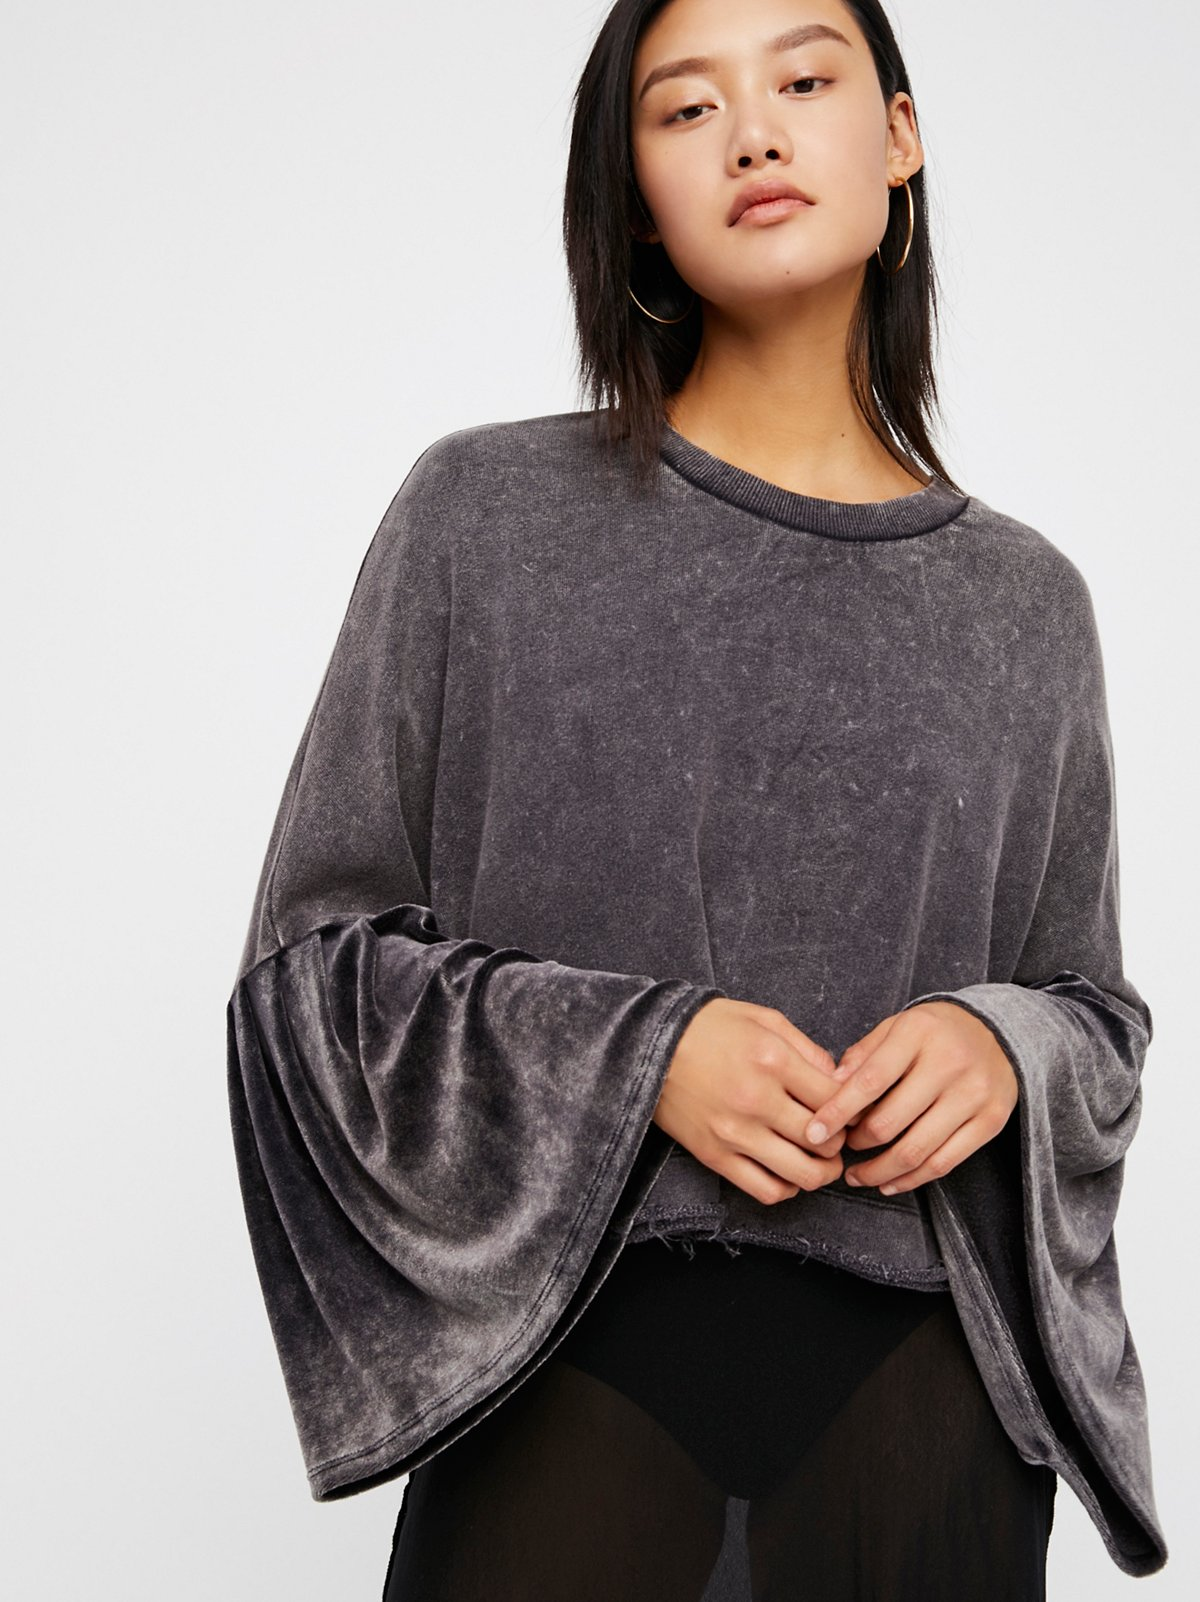 Sleeve Glorious Sleeves Pullover